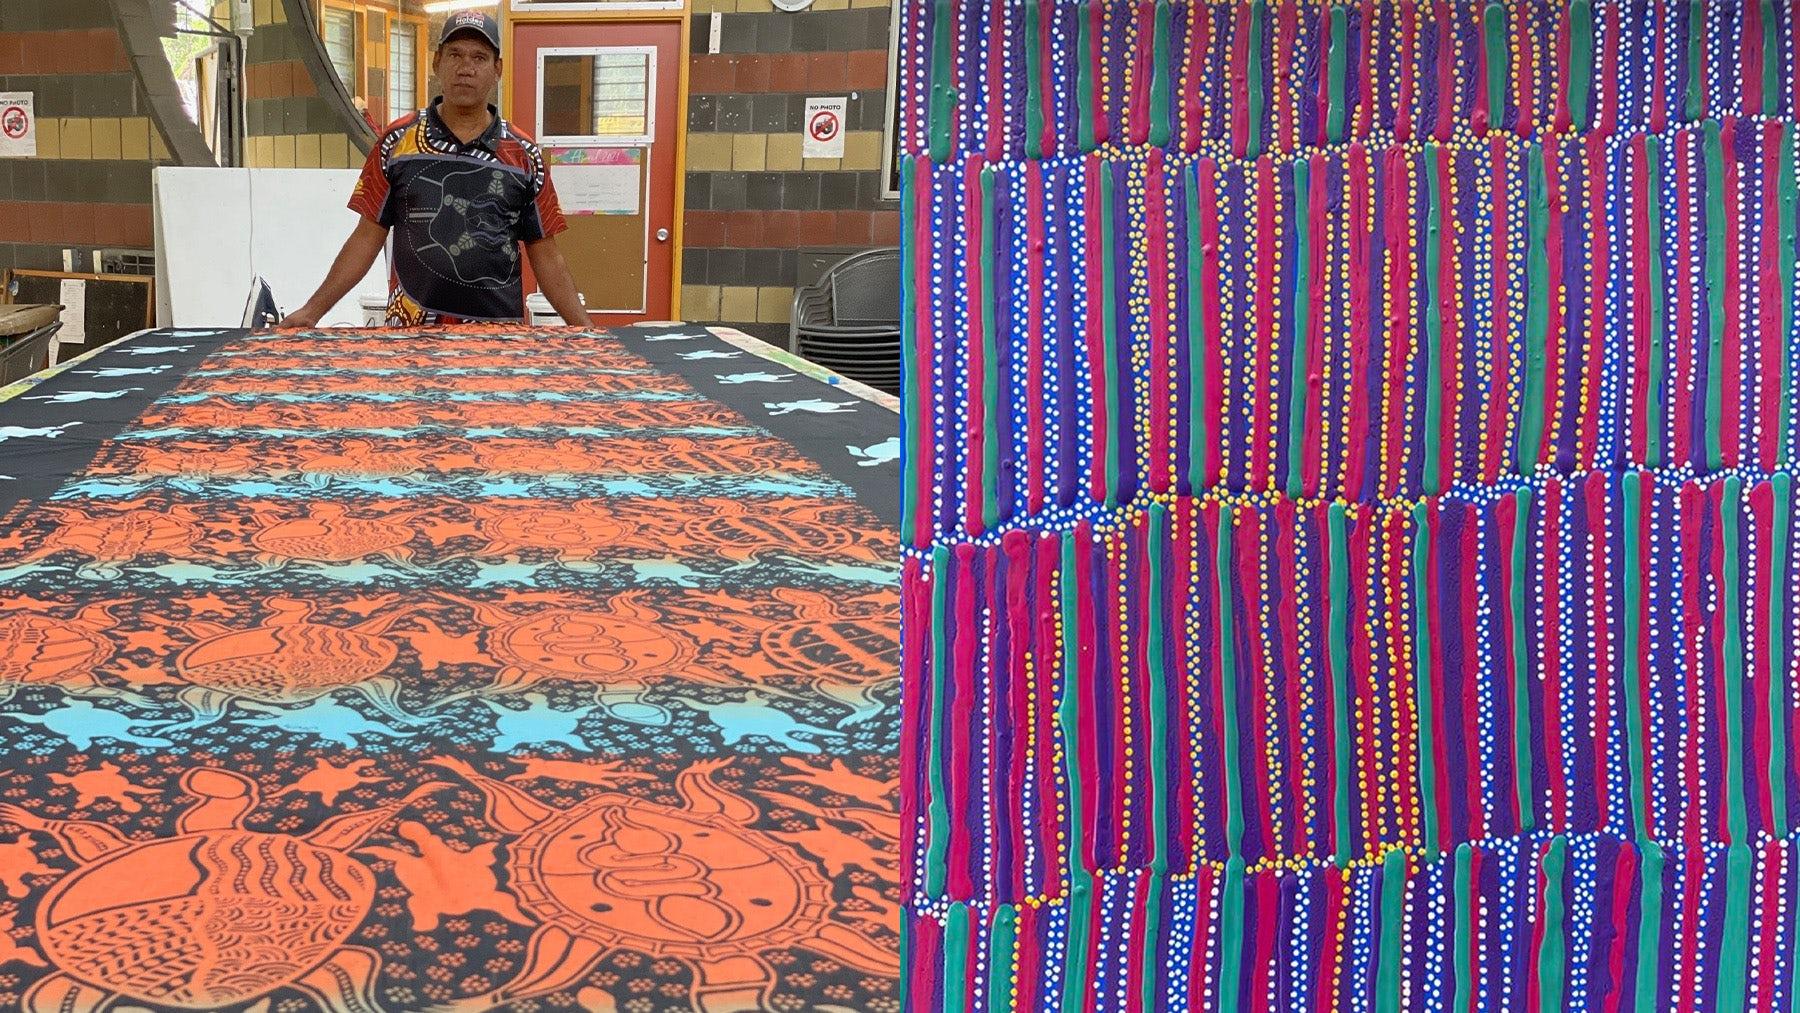 Wayne Connolly and his textile creation at Yarrabah Art Centre & Cultural Precinct; Design by artist Lisa Michl Ko-manggén OAM. Bernard Singleton; Cape York Arts.